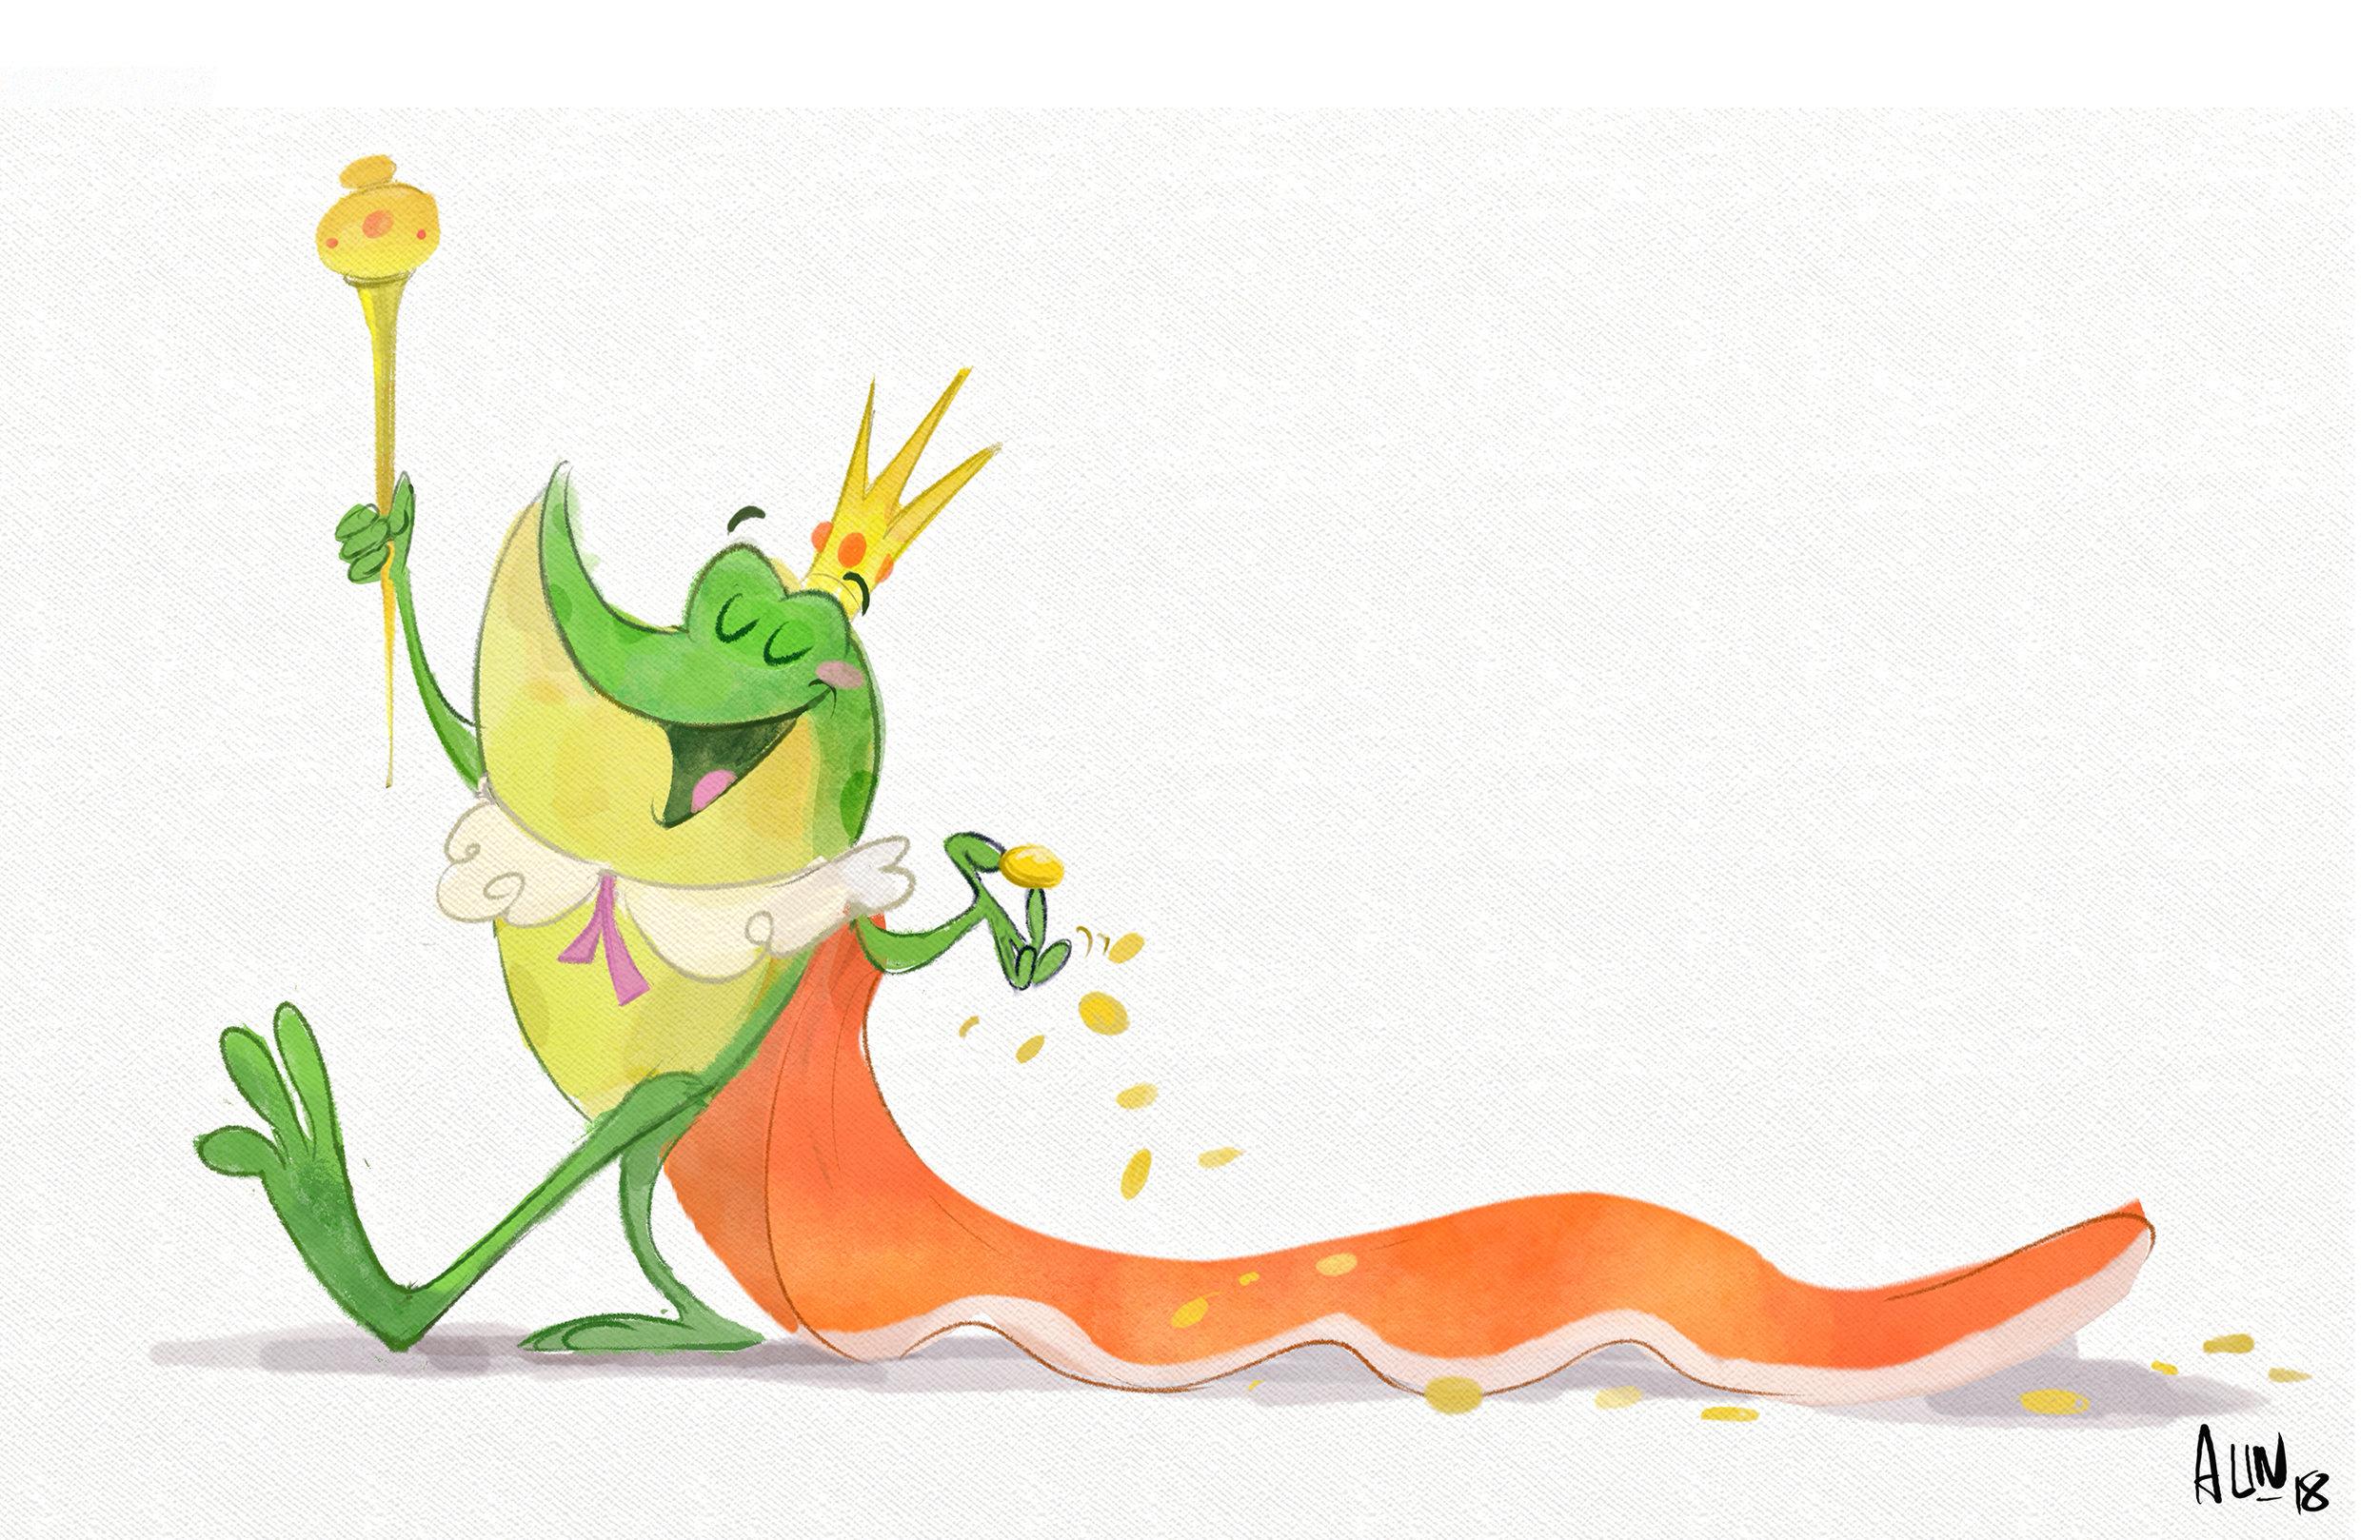 arthur_lin-character_design_for_animation-wk7-168842864.jpg